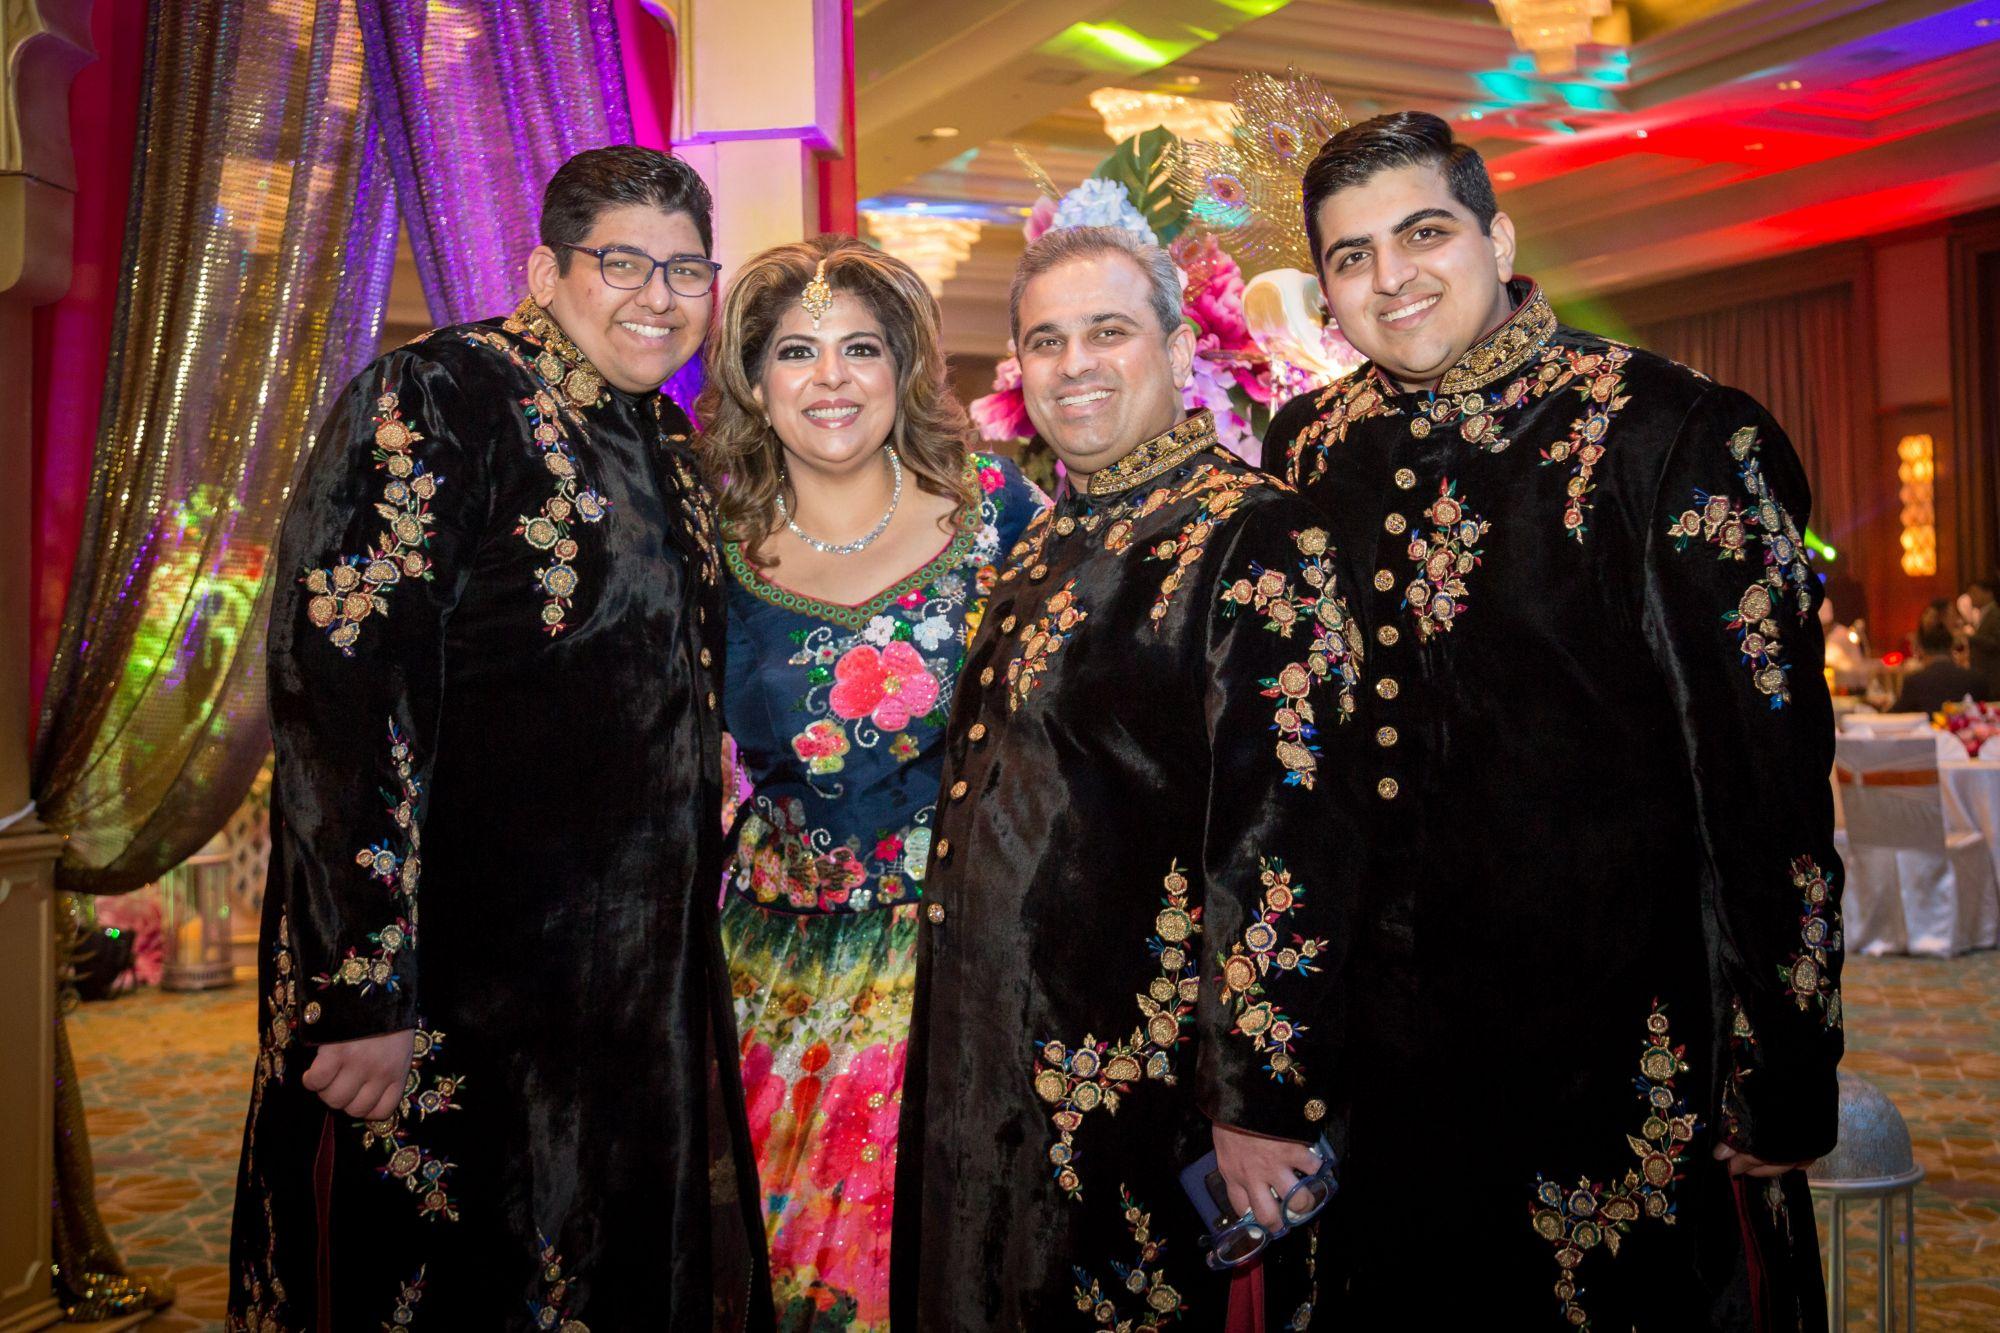 Neeraf, Lavina, Sharan and Devesh Valiram